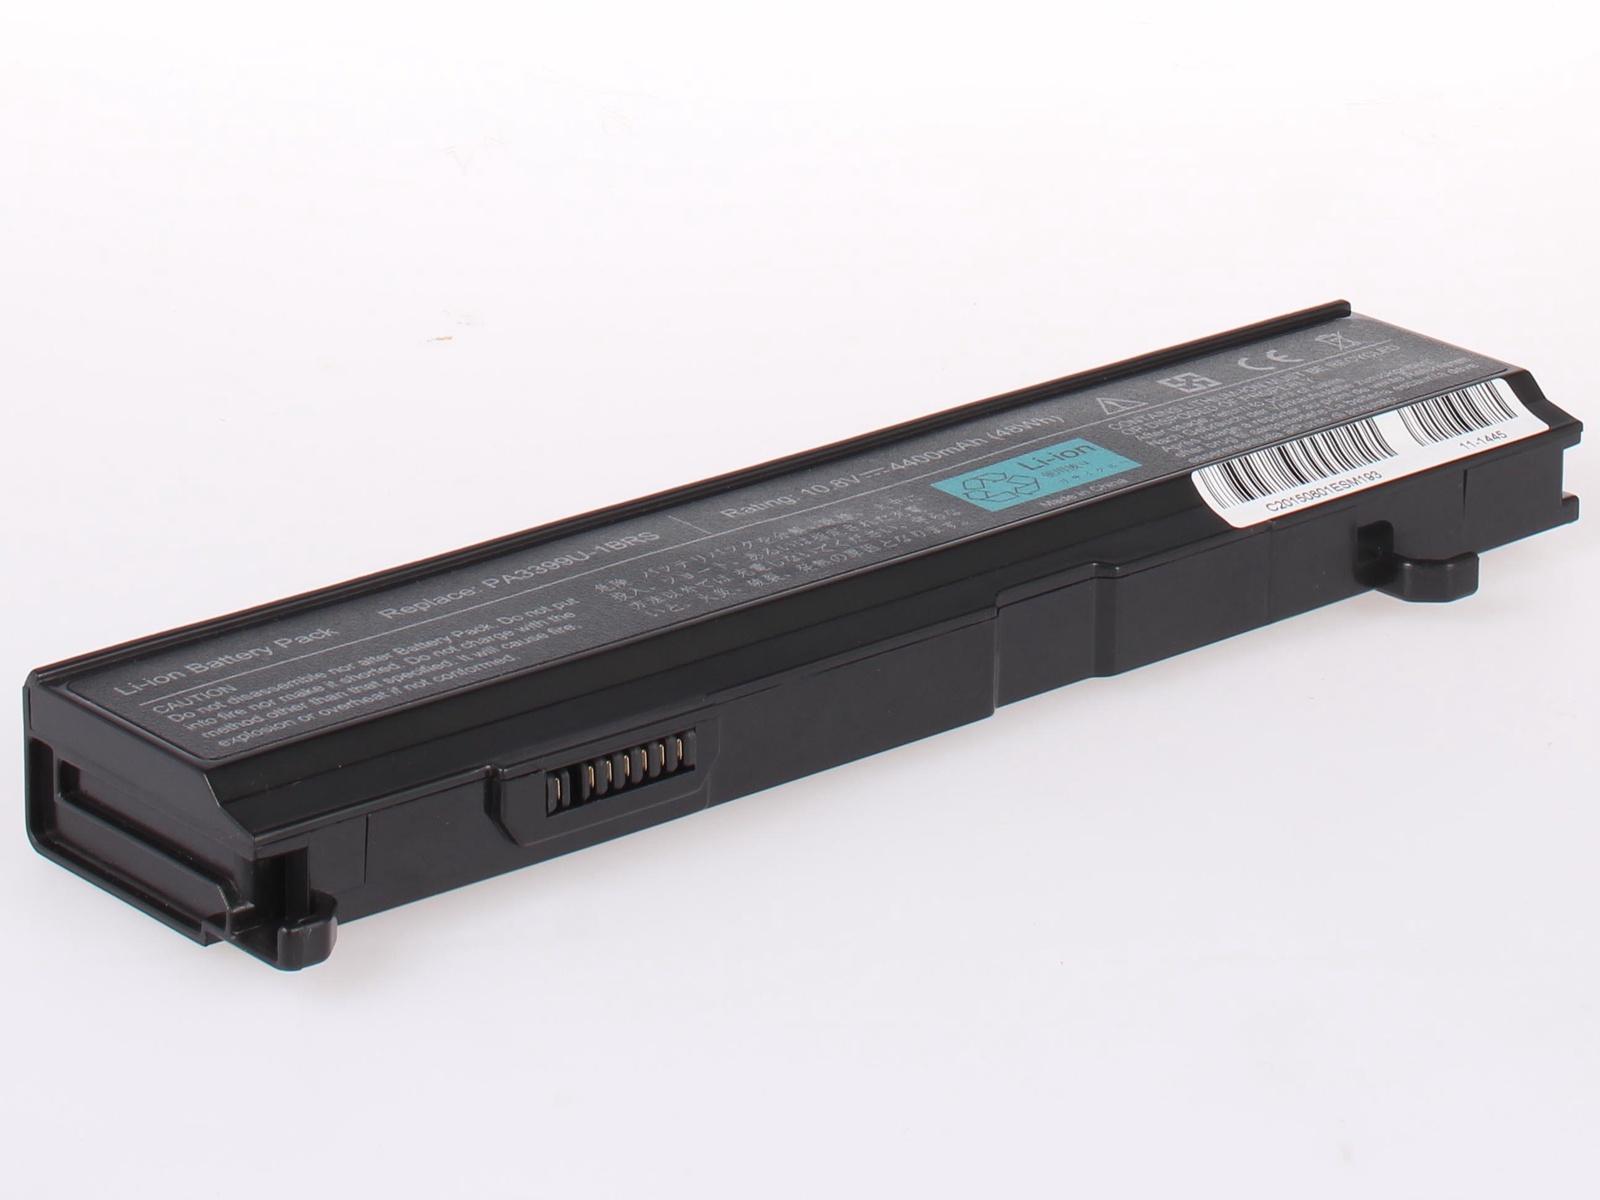 Аккумулятор для ноутбука AnyBatt для ToshiBa Satellite M100-221, Satellite M70-131, Satellite A100-003, Satellite A100-071, Satellite M105, Tecra A4, Satellite A100-599, Satellite A85, Satellite M55, Satellite A100-786 цена